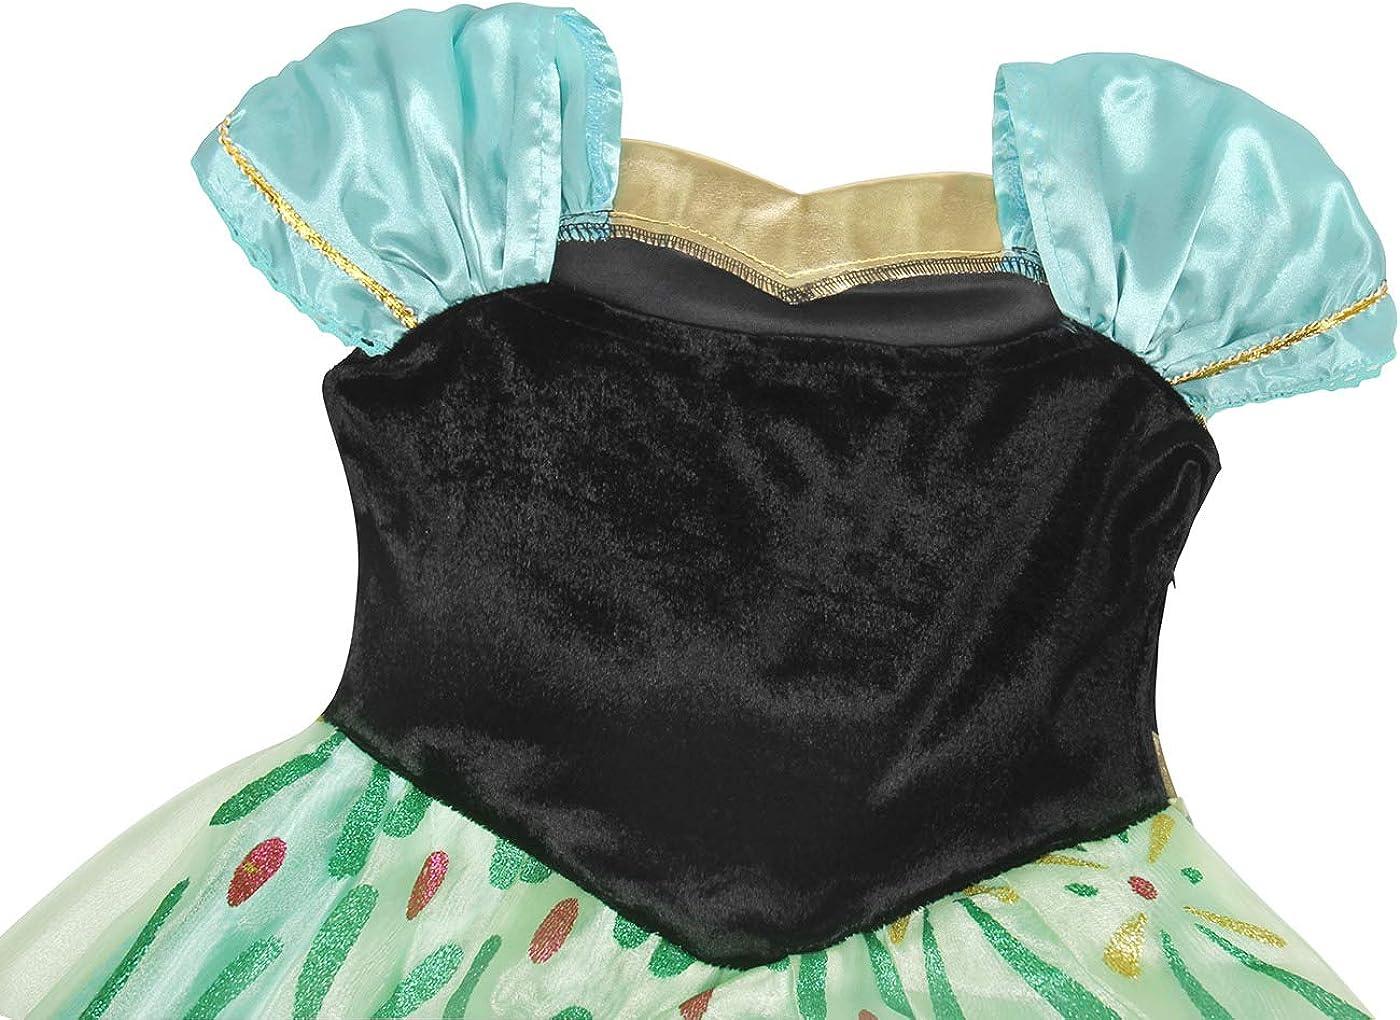 AmzBarley Dress Girls Costume Queen Birthday Party Halloween Kids Clothes